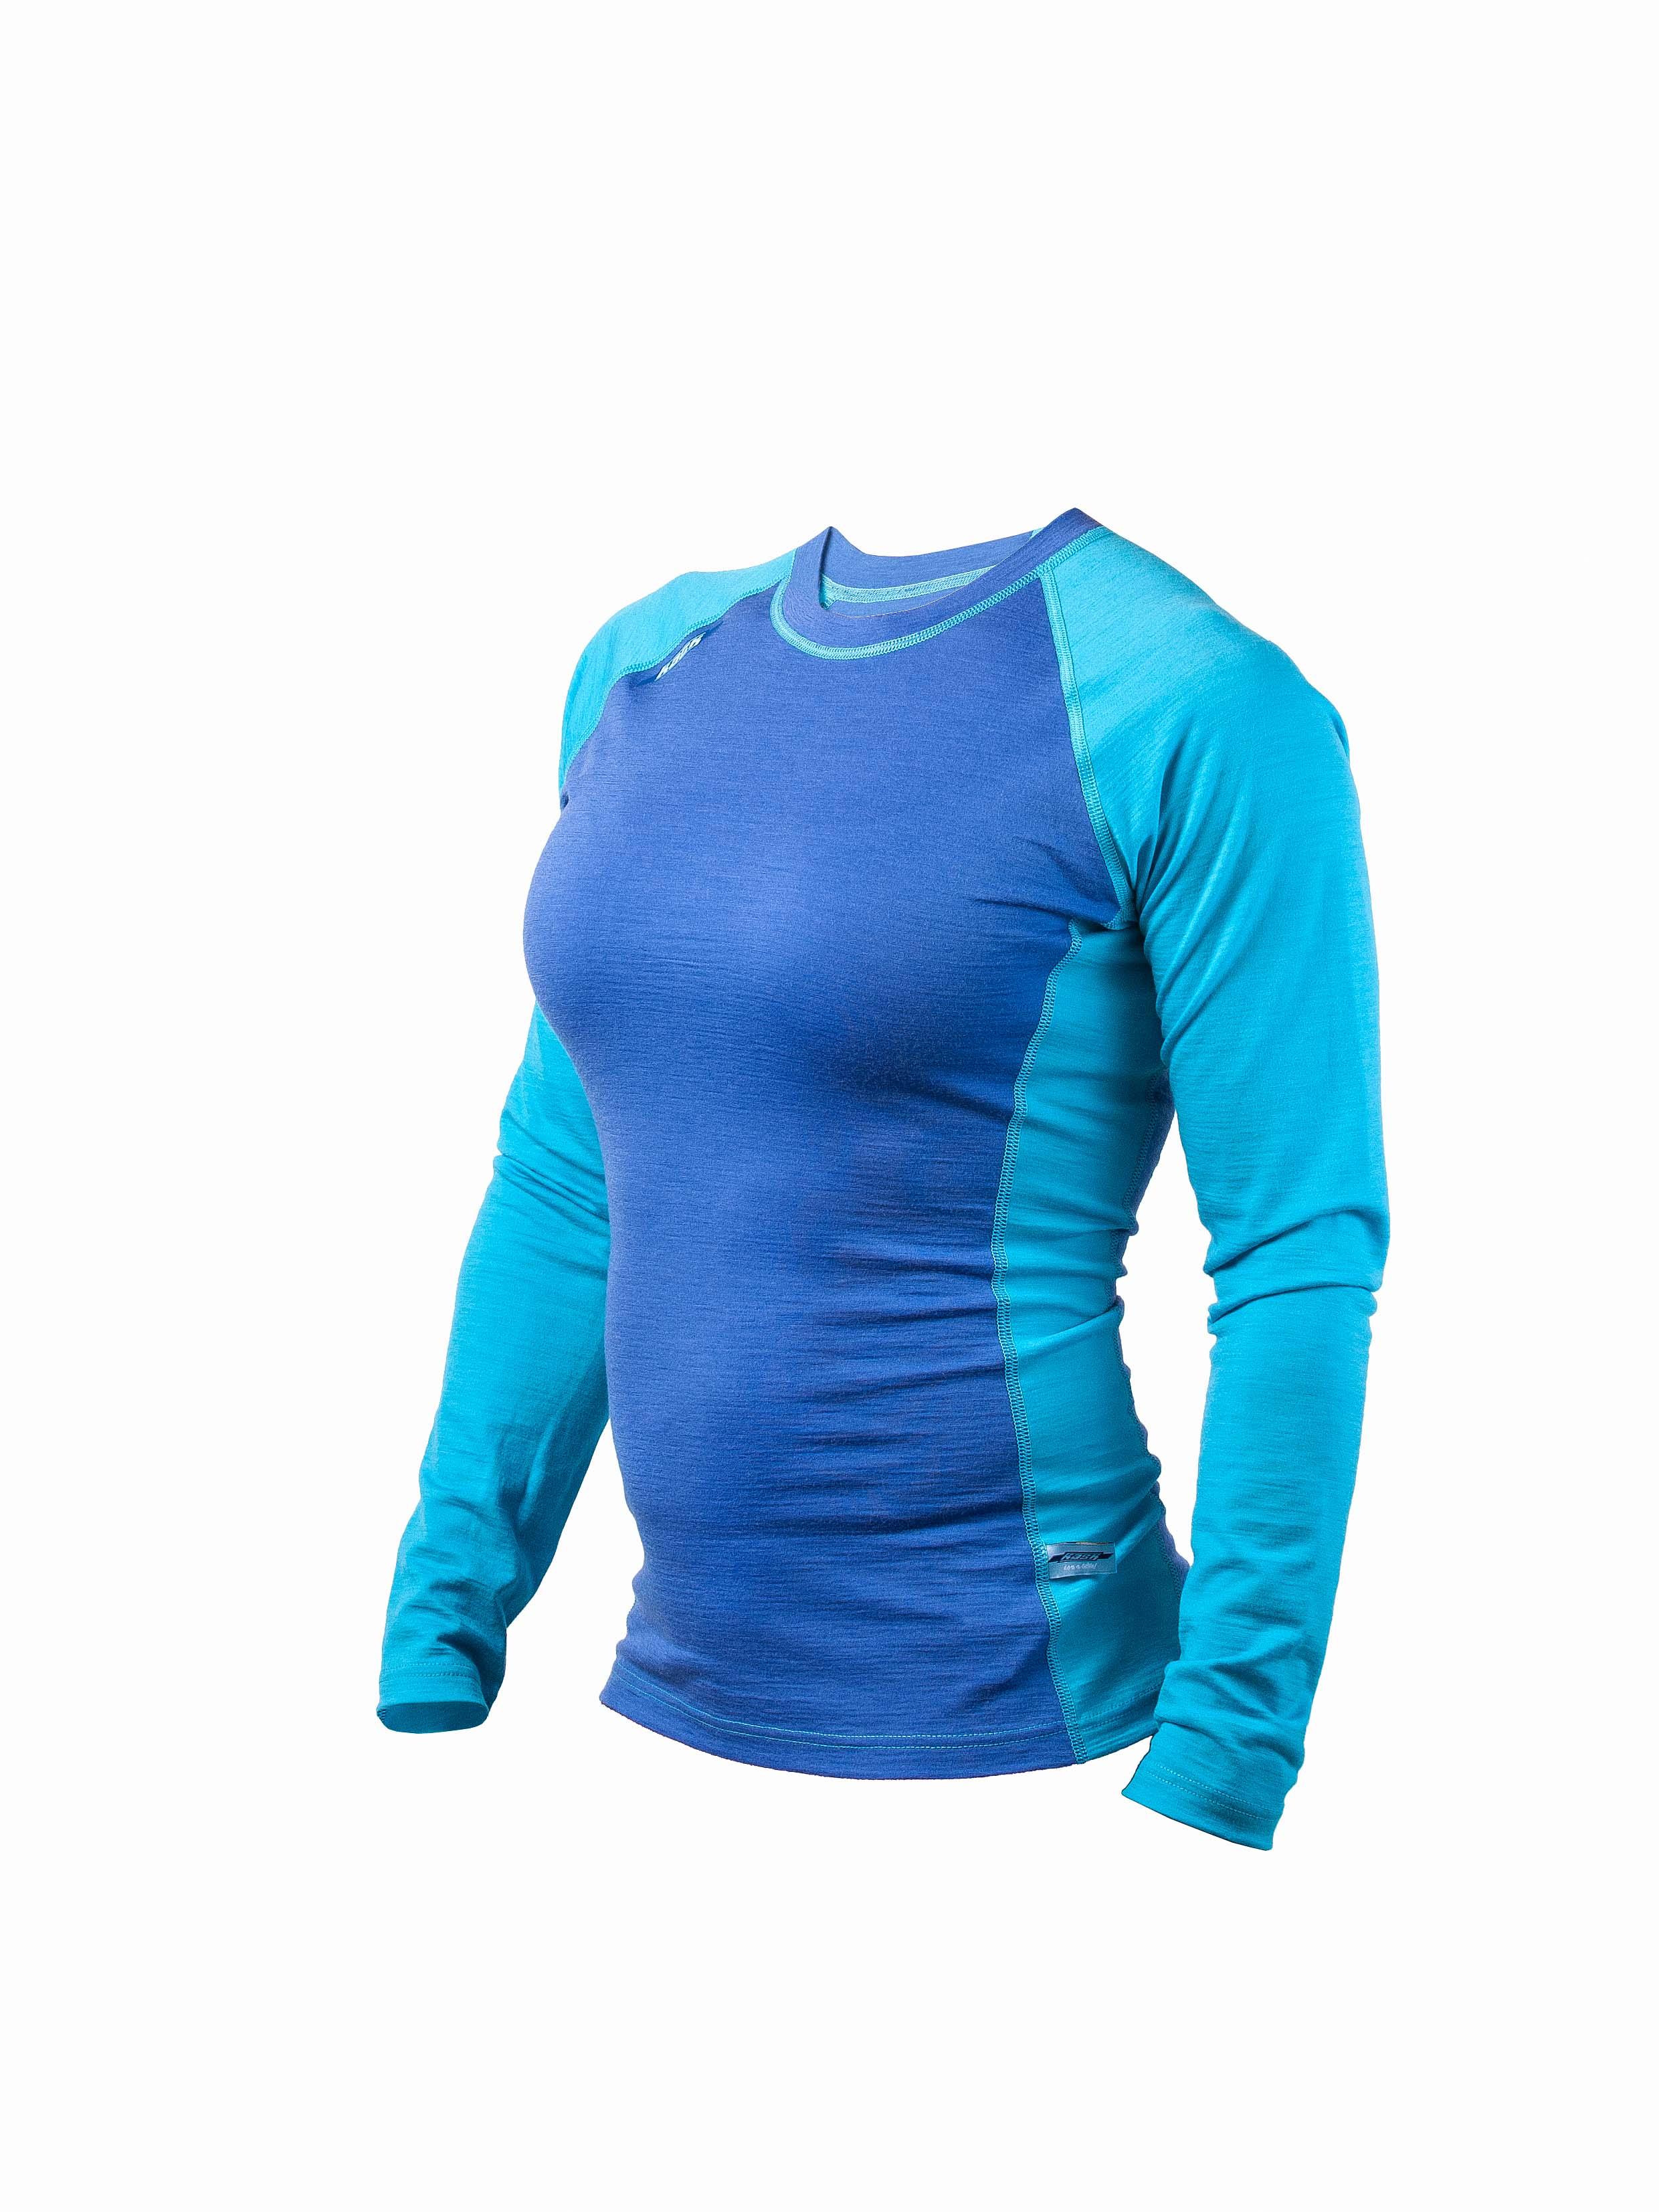 Dámské merino tričko KASK - Womens Crew 200 c405b3cd31